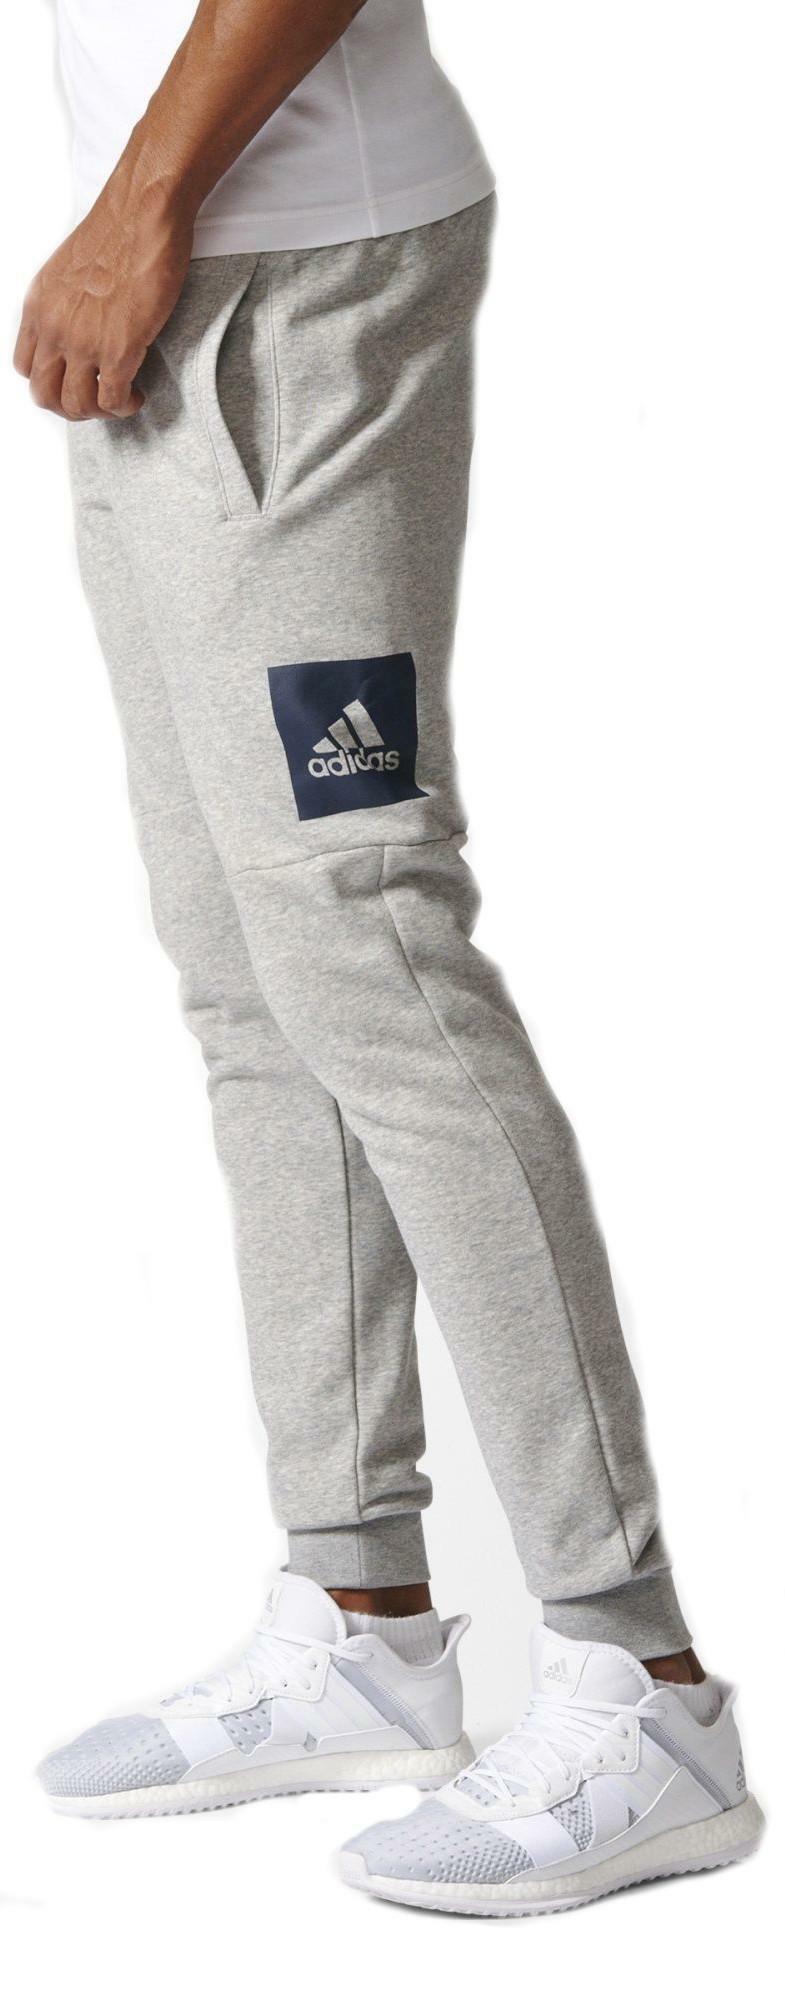 pantaloni tuta adidas cotone uomo